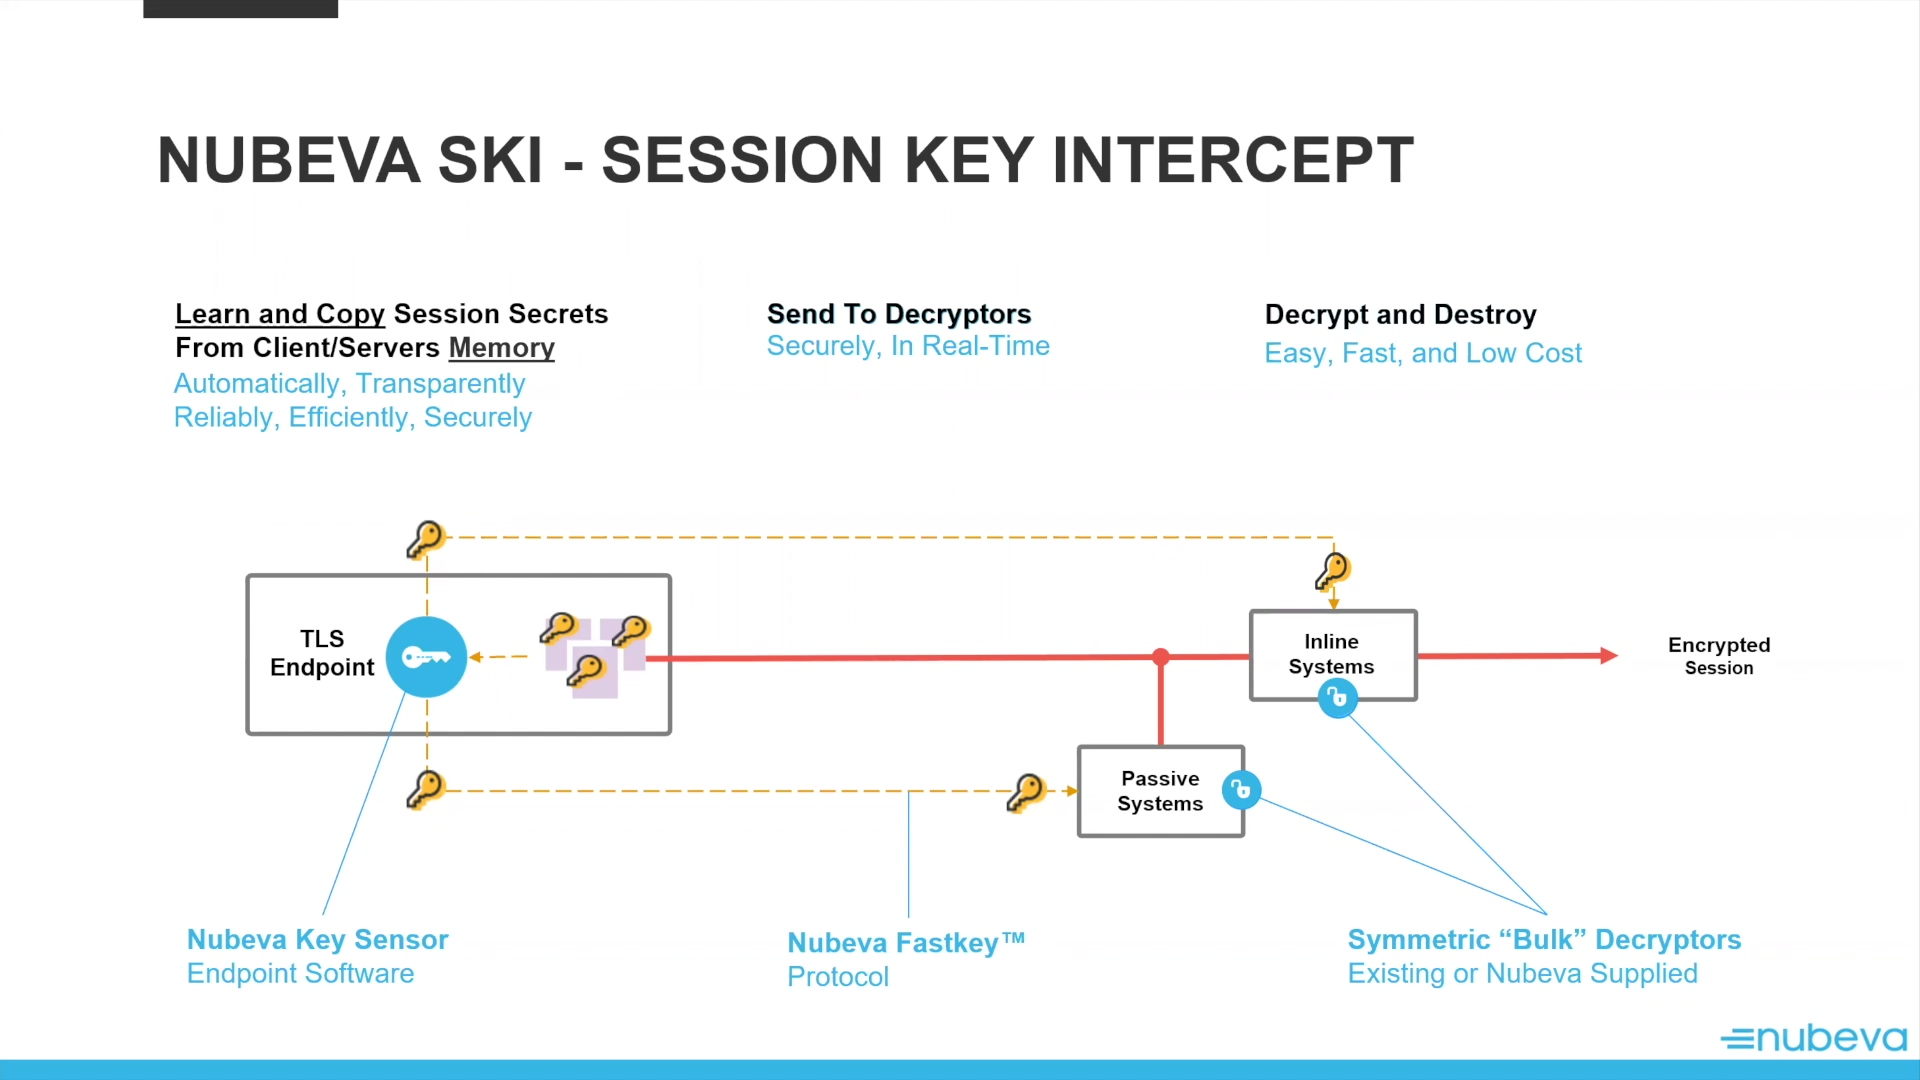 Nubeva Session Key Intercept Overview